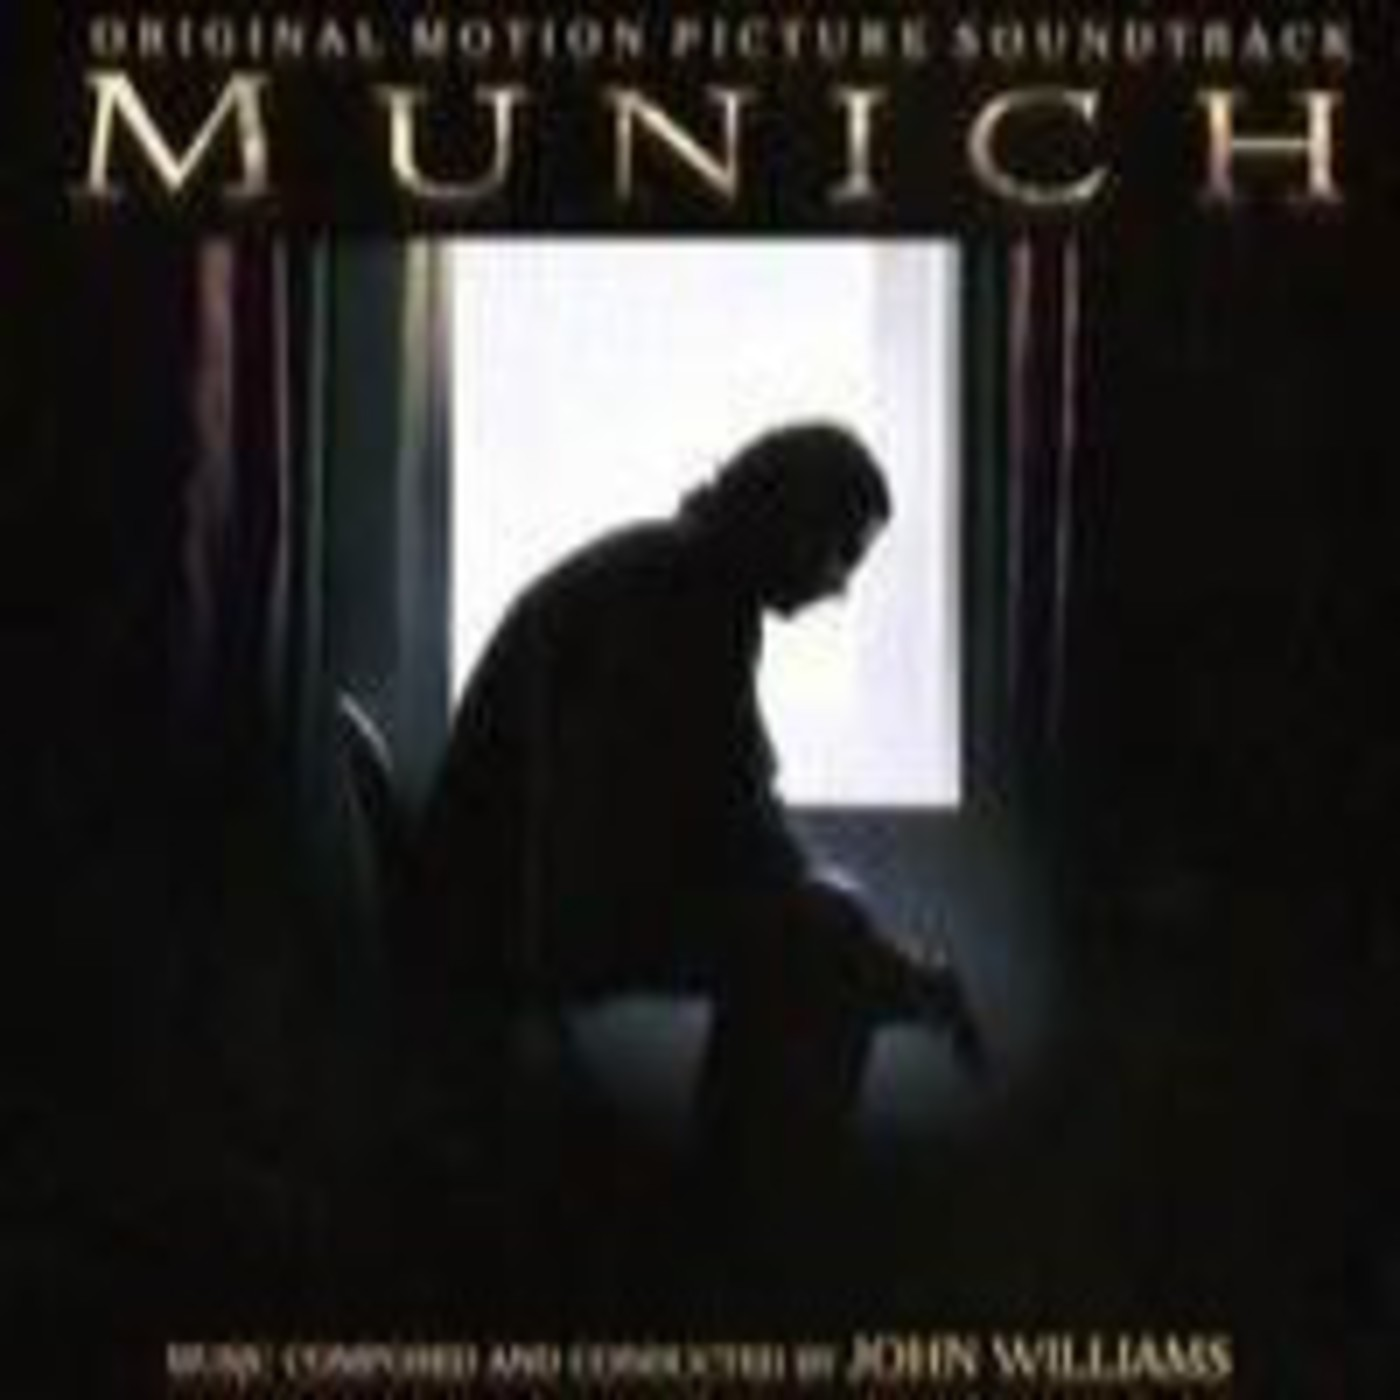 Jhon williams remembering munich bso munich en musicas for Cuarto milenio radio horario